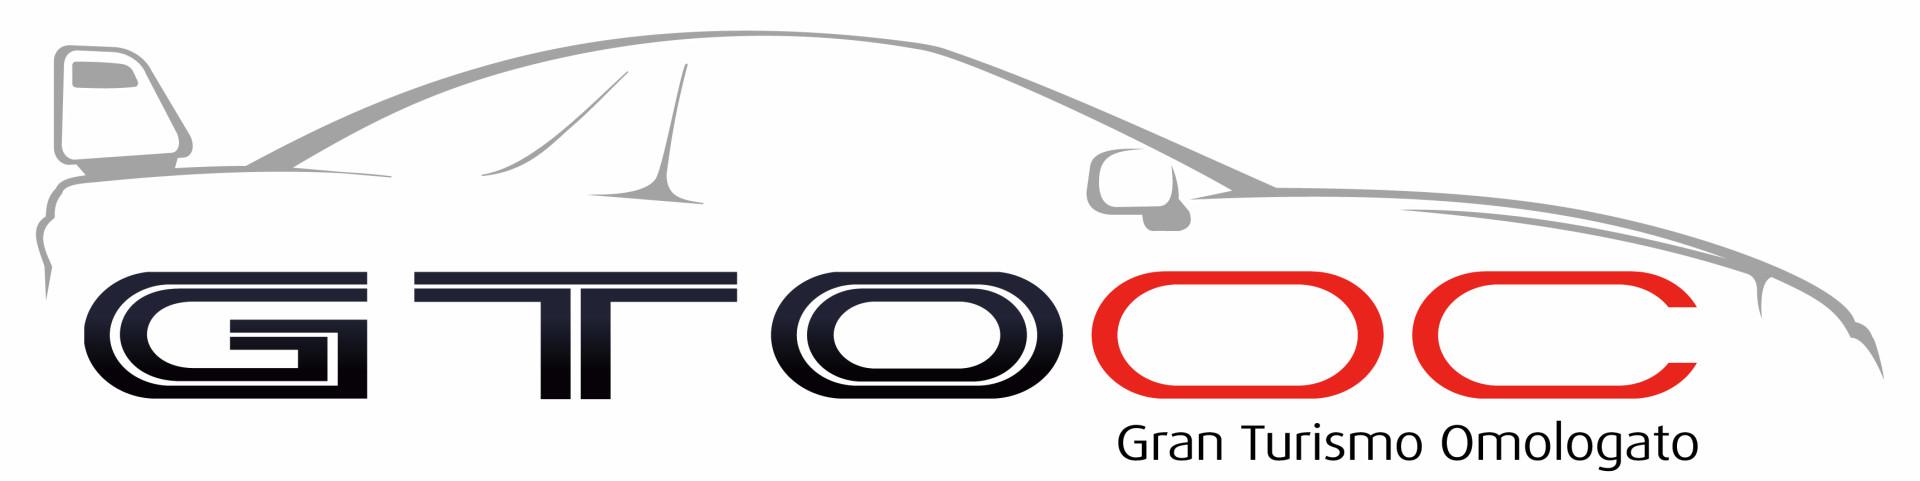 GTOOC Home Page